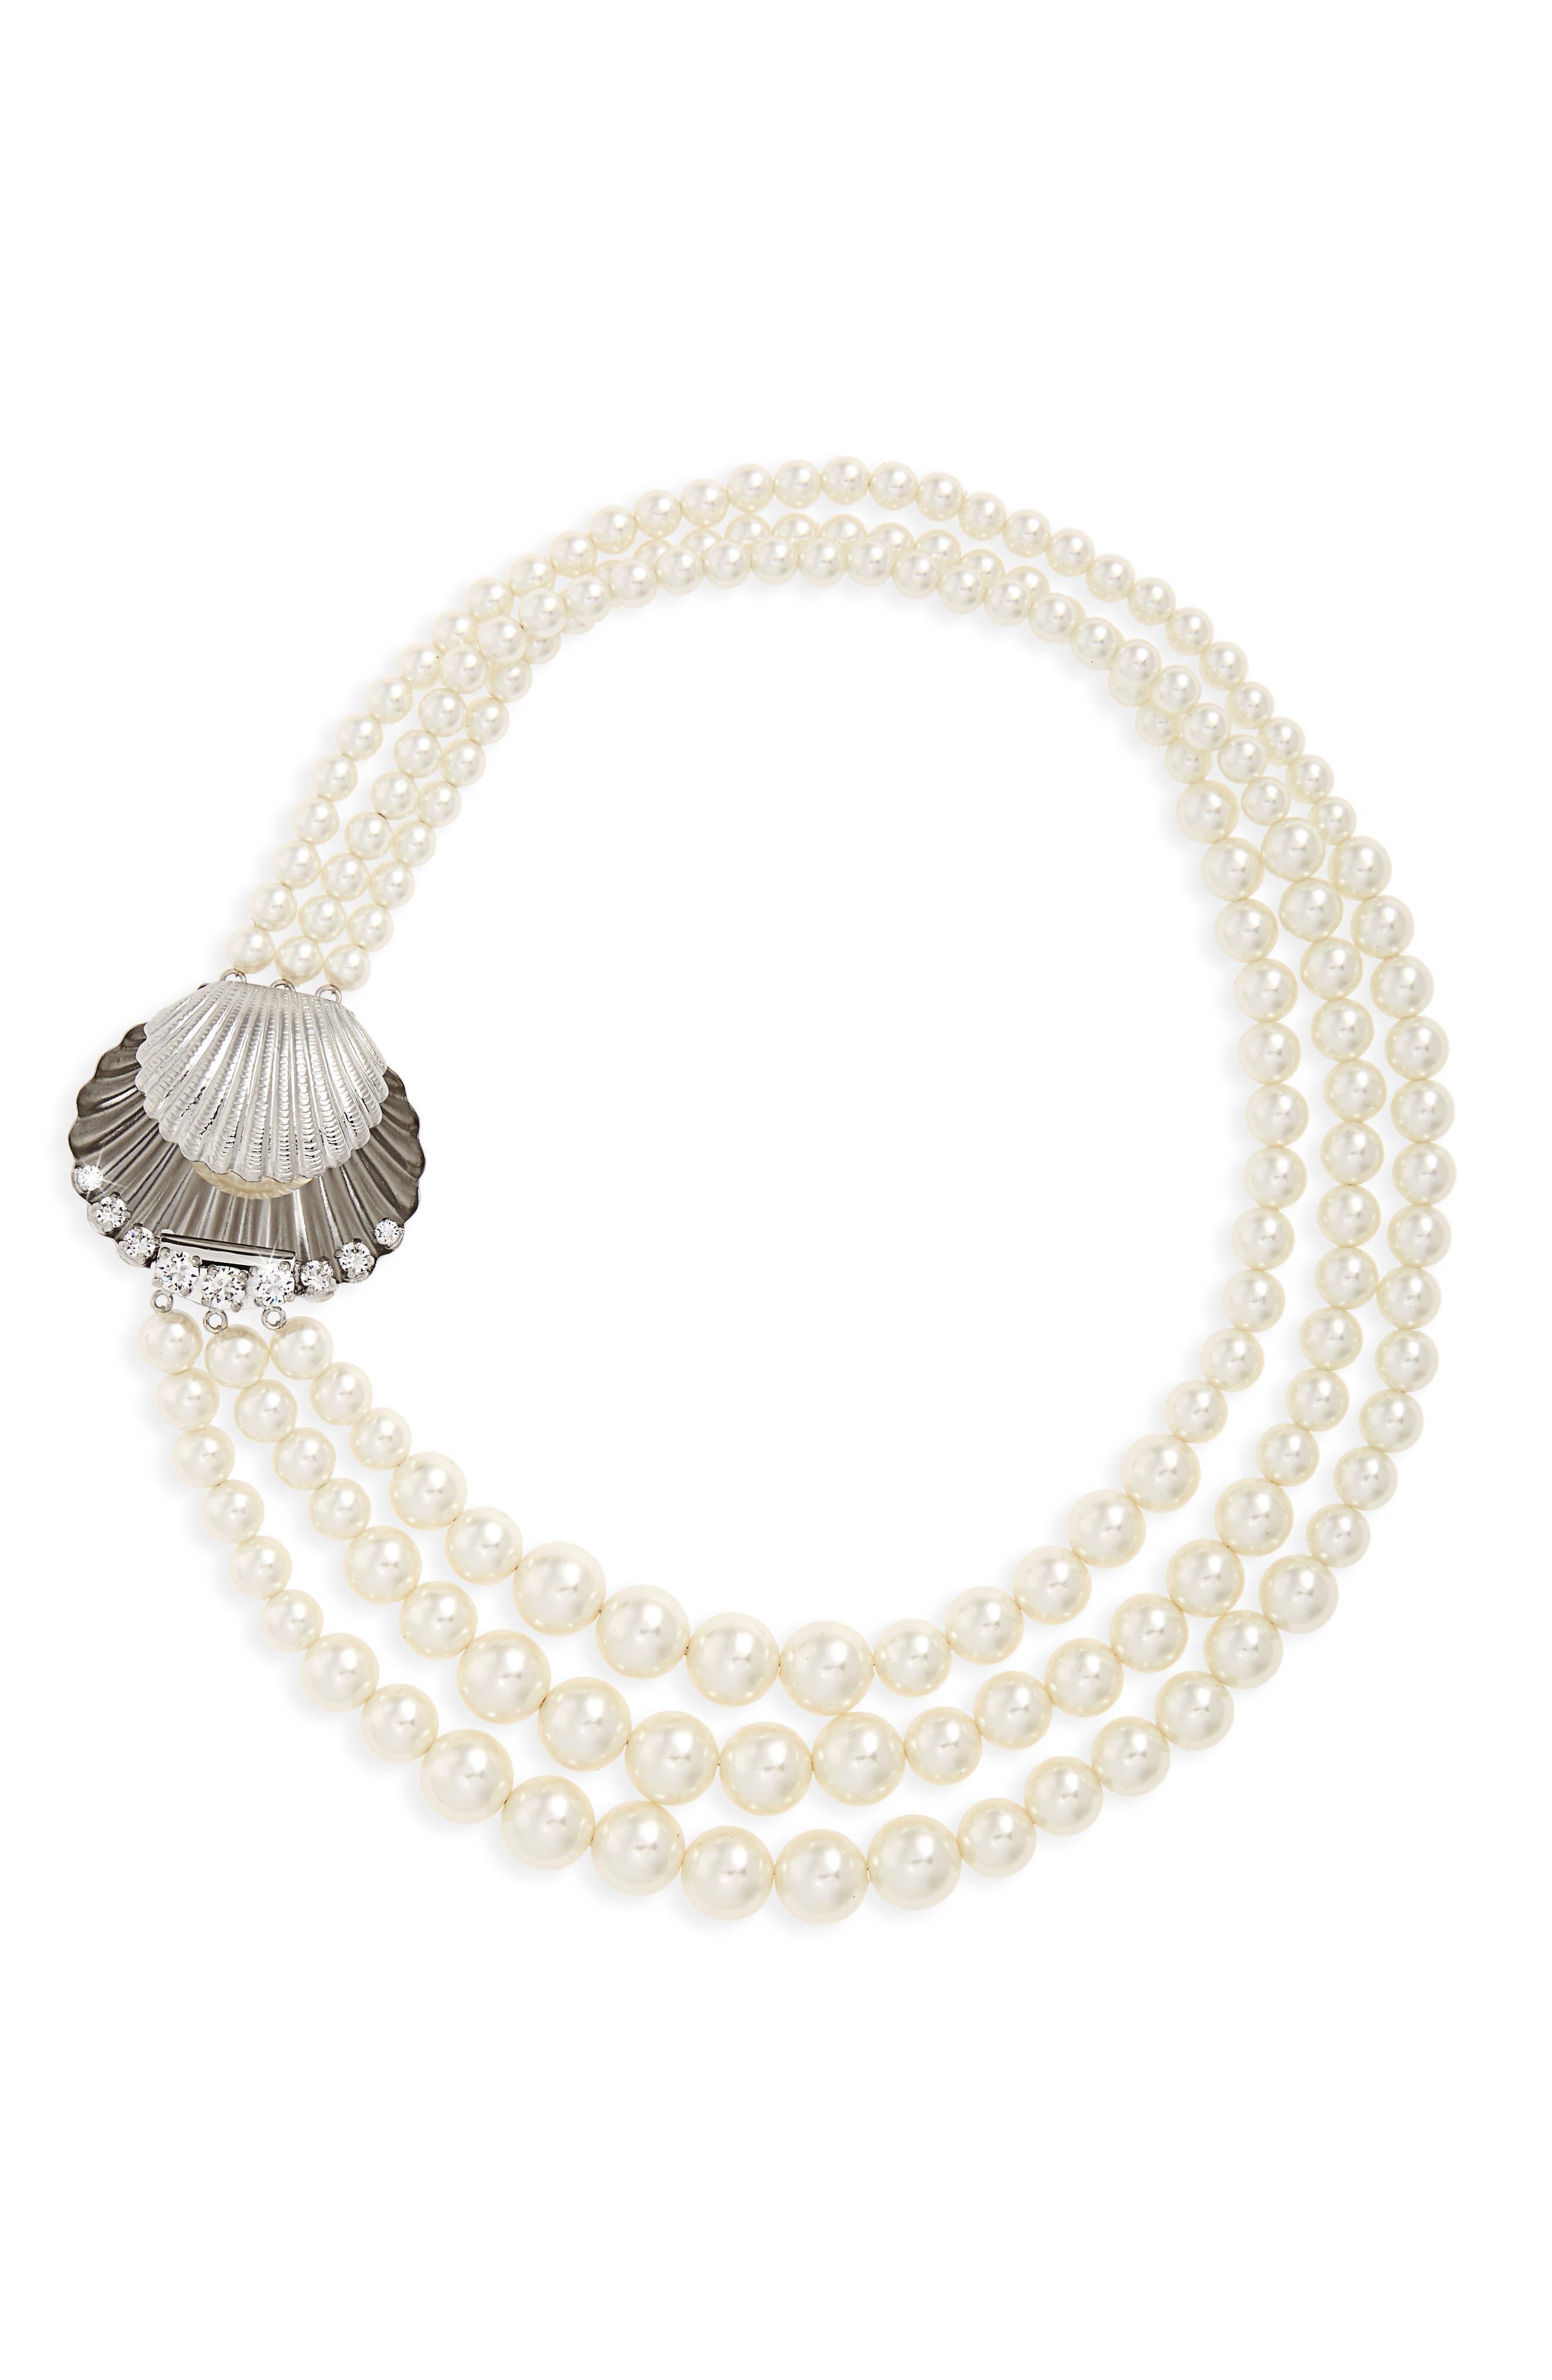 Multistrand Imitation Pearl Necklace,                         Main,                         color, Pearl